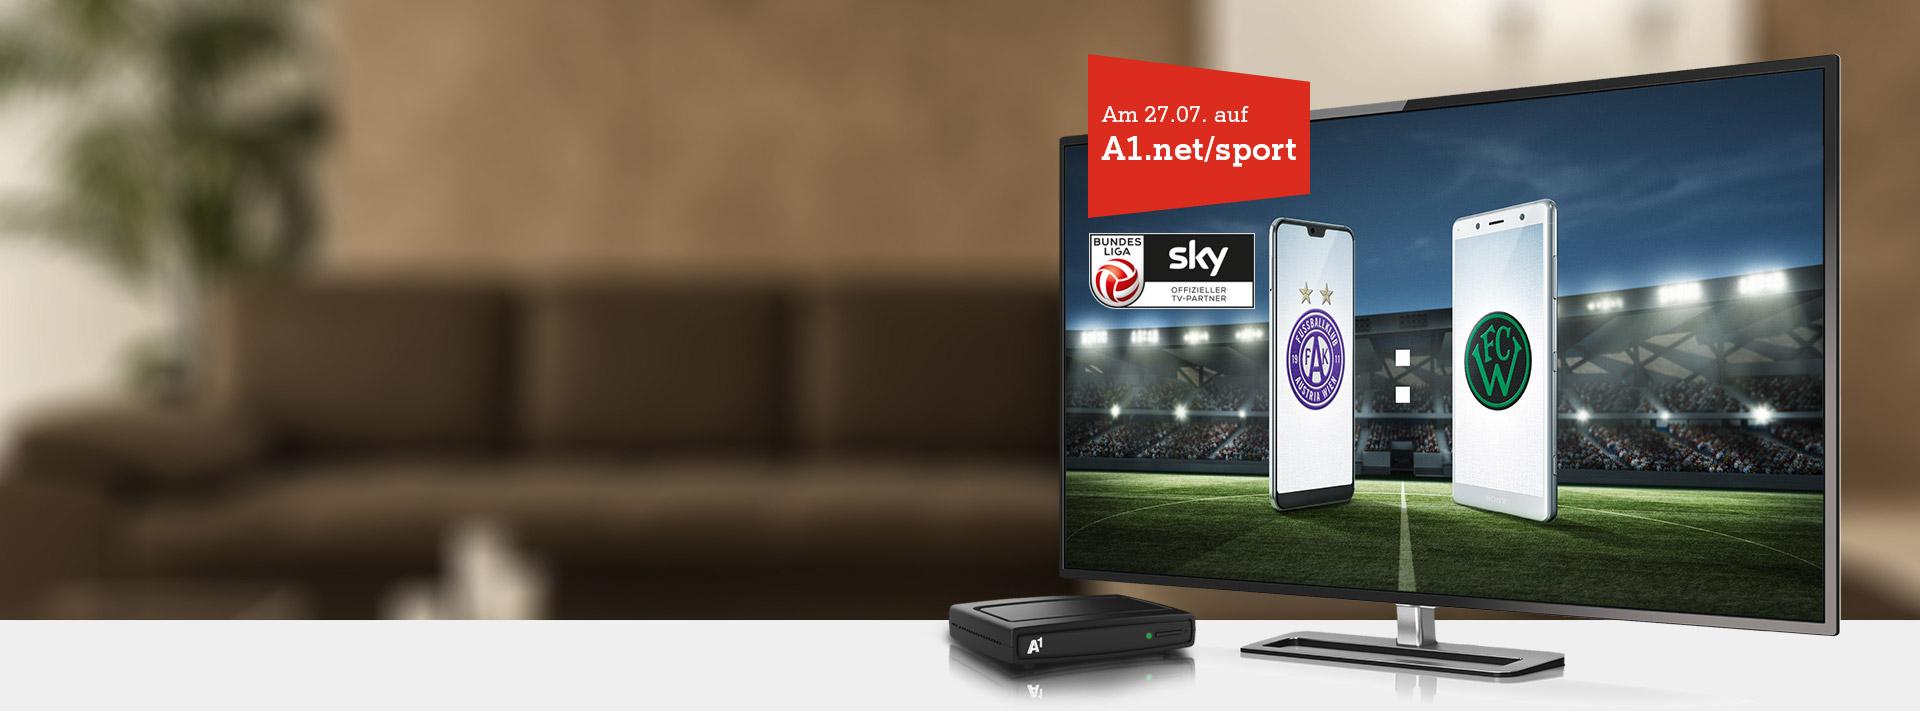 Fußball Bundesliga auf A1.net/sport